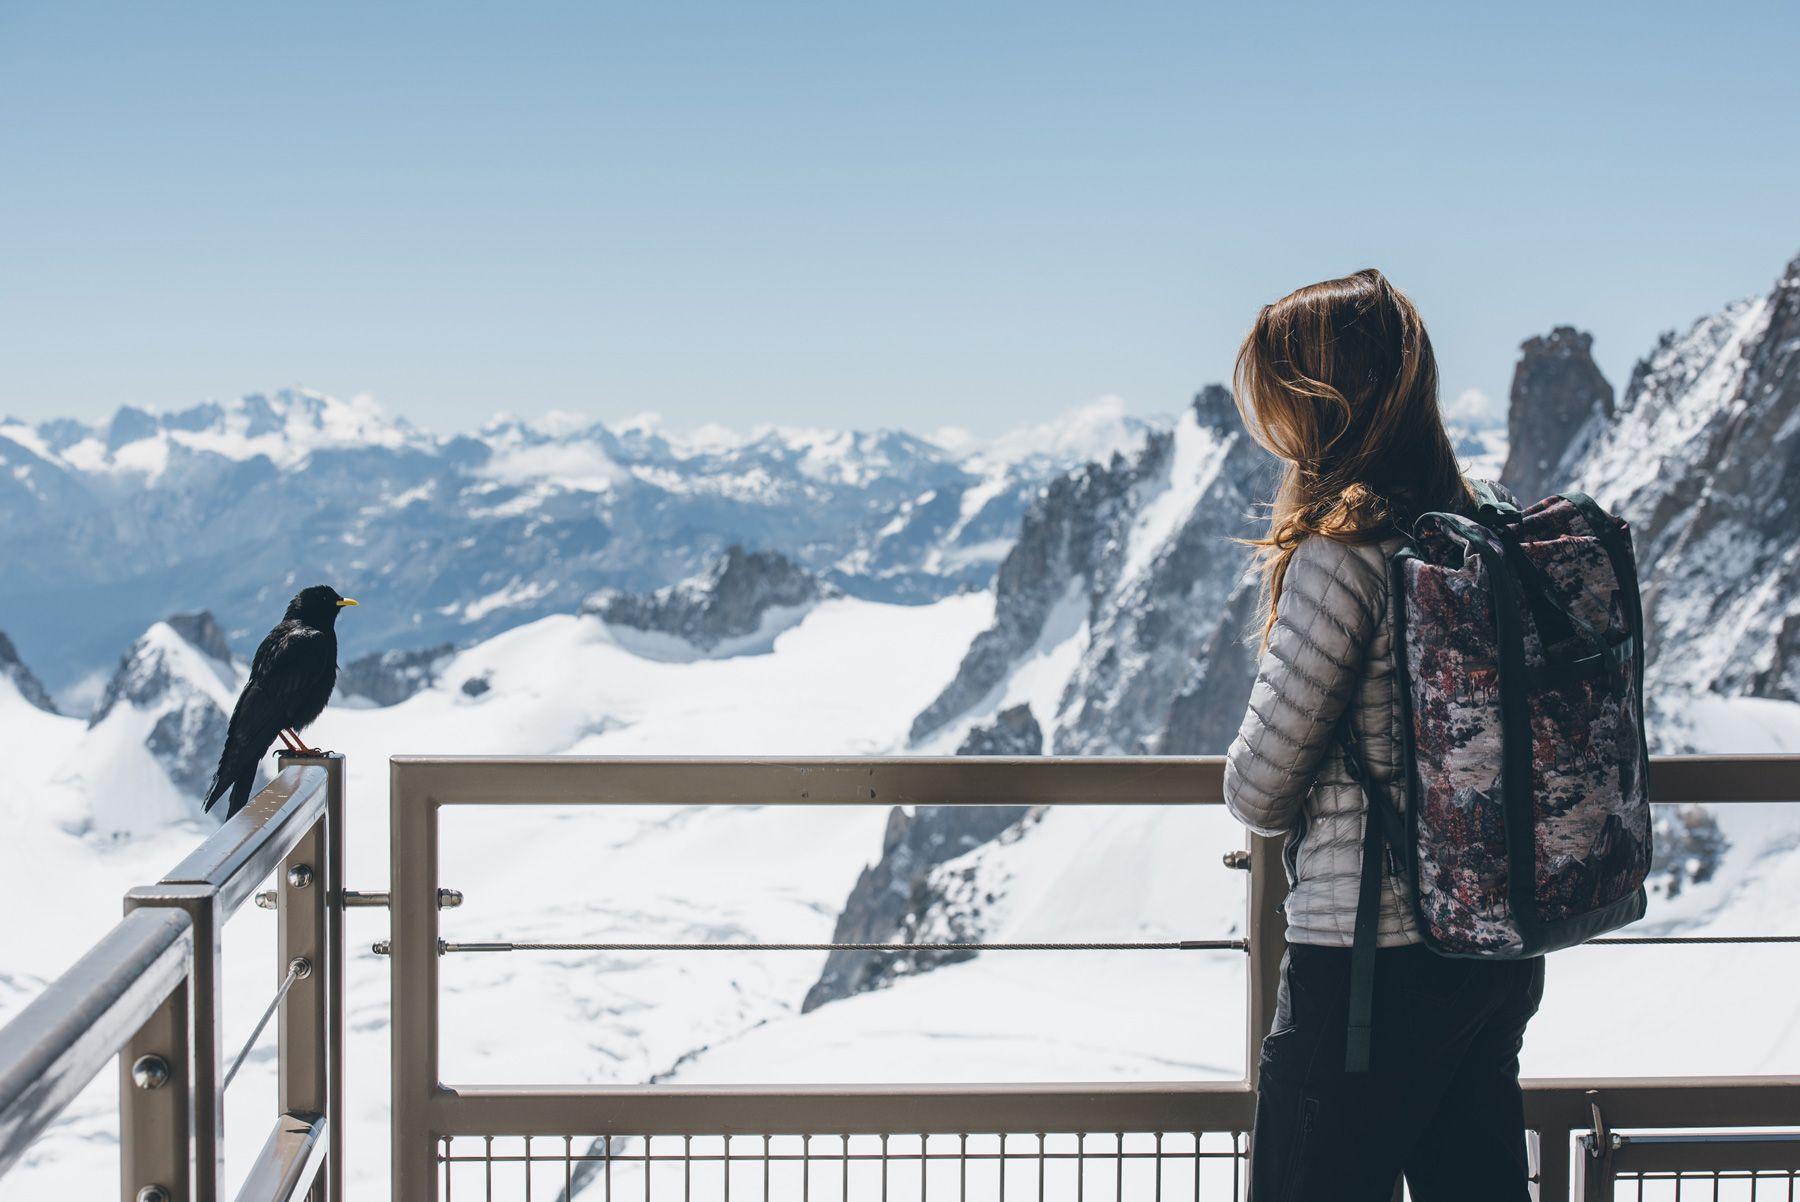 Aventures A Chamonix Mont Blanc En 2020 Chamonix Chamonix Mont Blanc Aiguille Du Midi